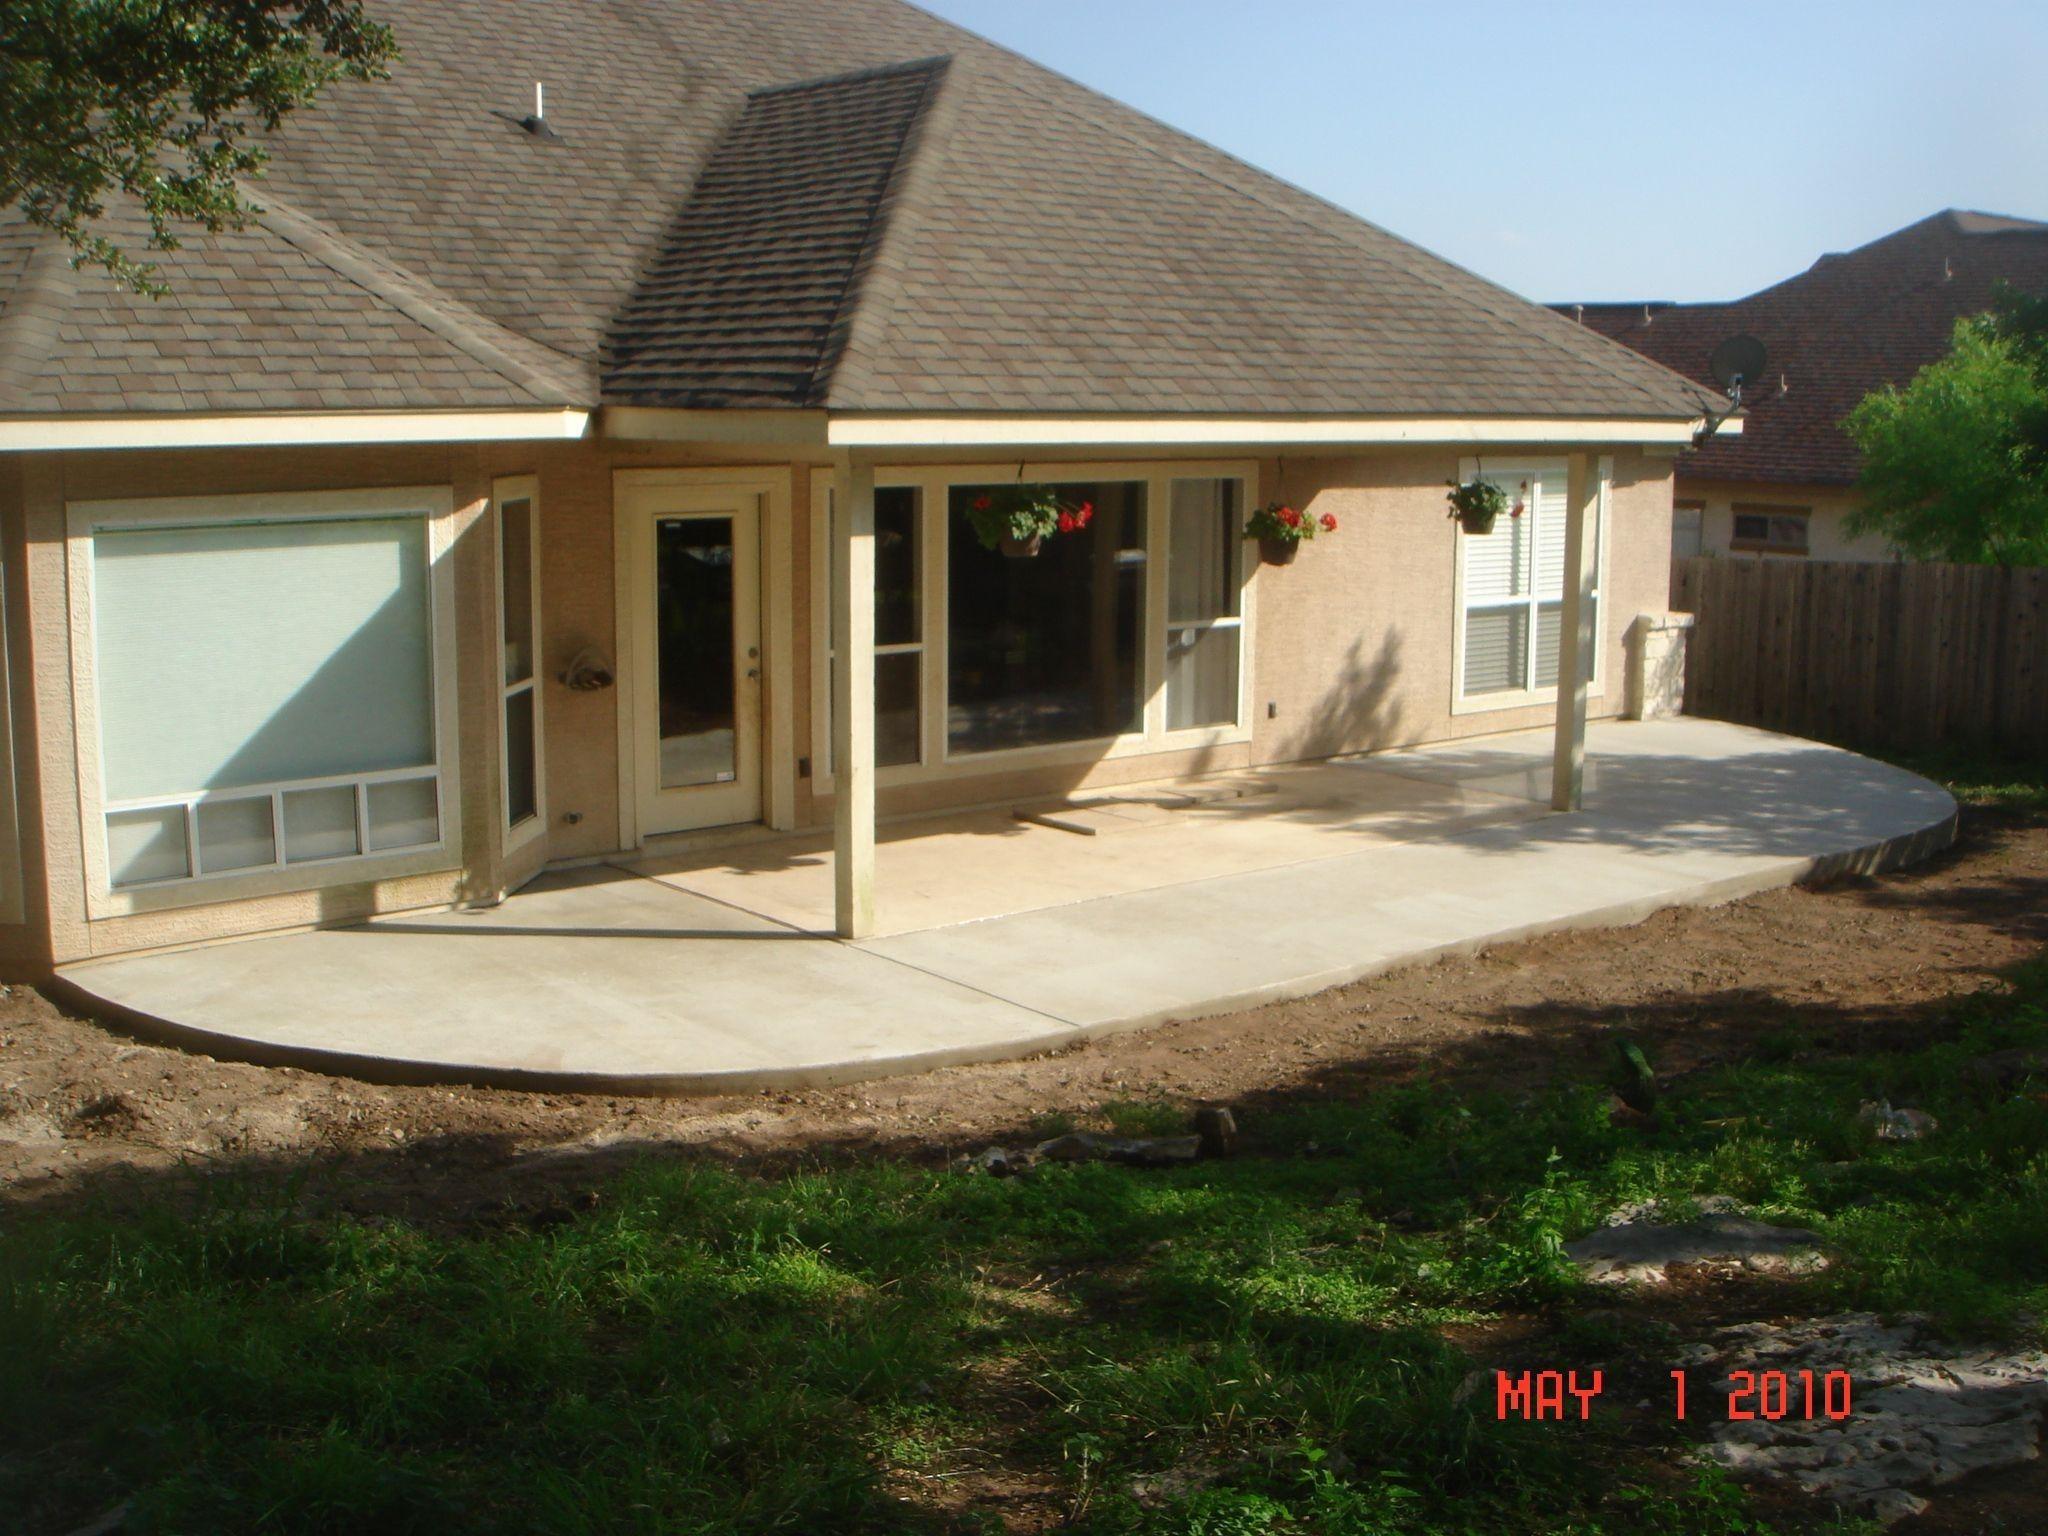 Most Amazing Patio Extension Ideas Bw03kq Https Sanantoniohomeinspector Biz Most Amazing Patio Extension Ideas Concrete Patio Extension Ideas Backyard Patio